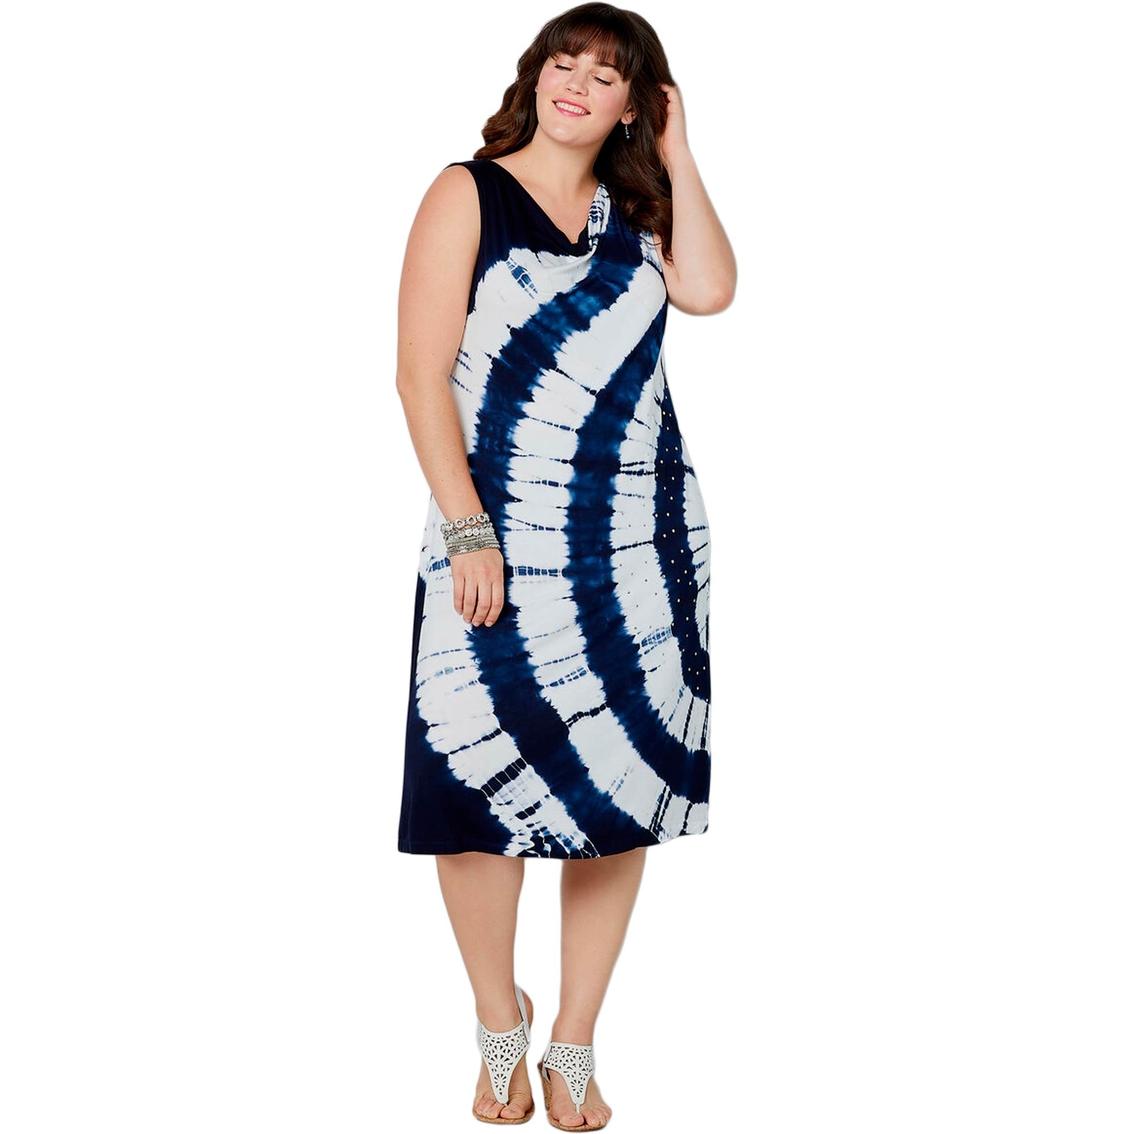 Avenue Plus Size Tie Dye Dress With Stud Trim | Dresses ...